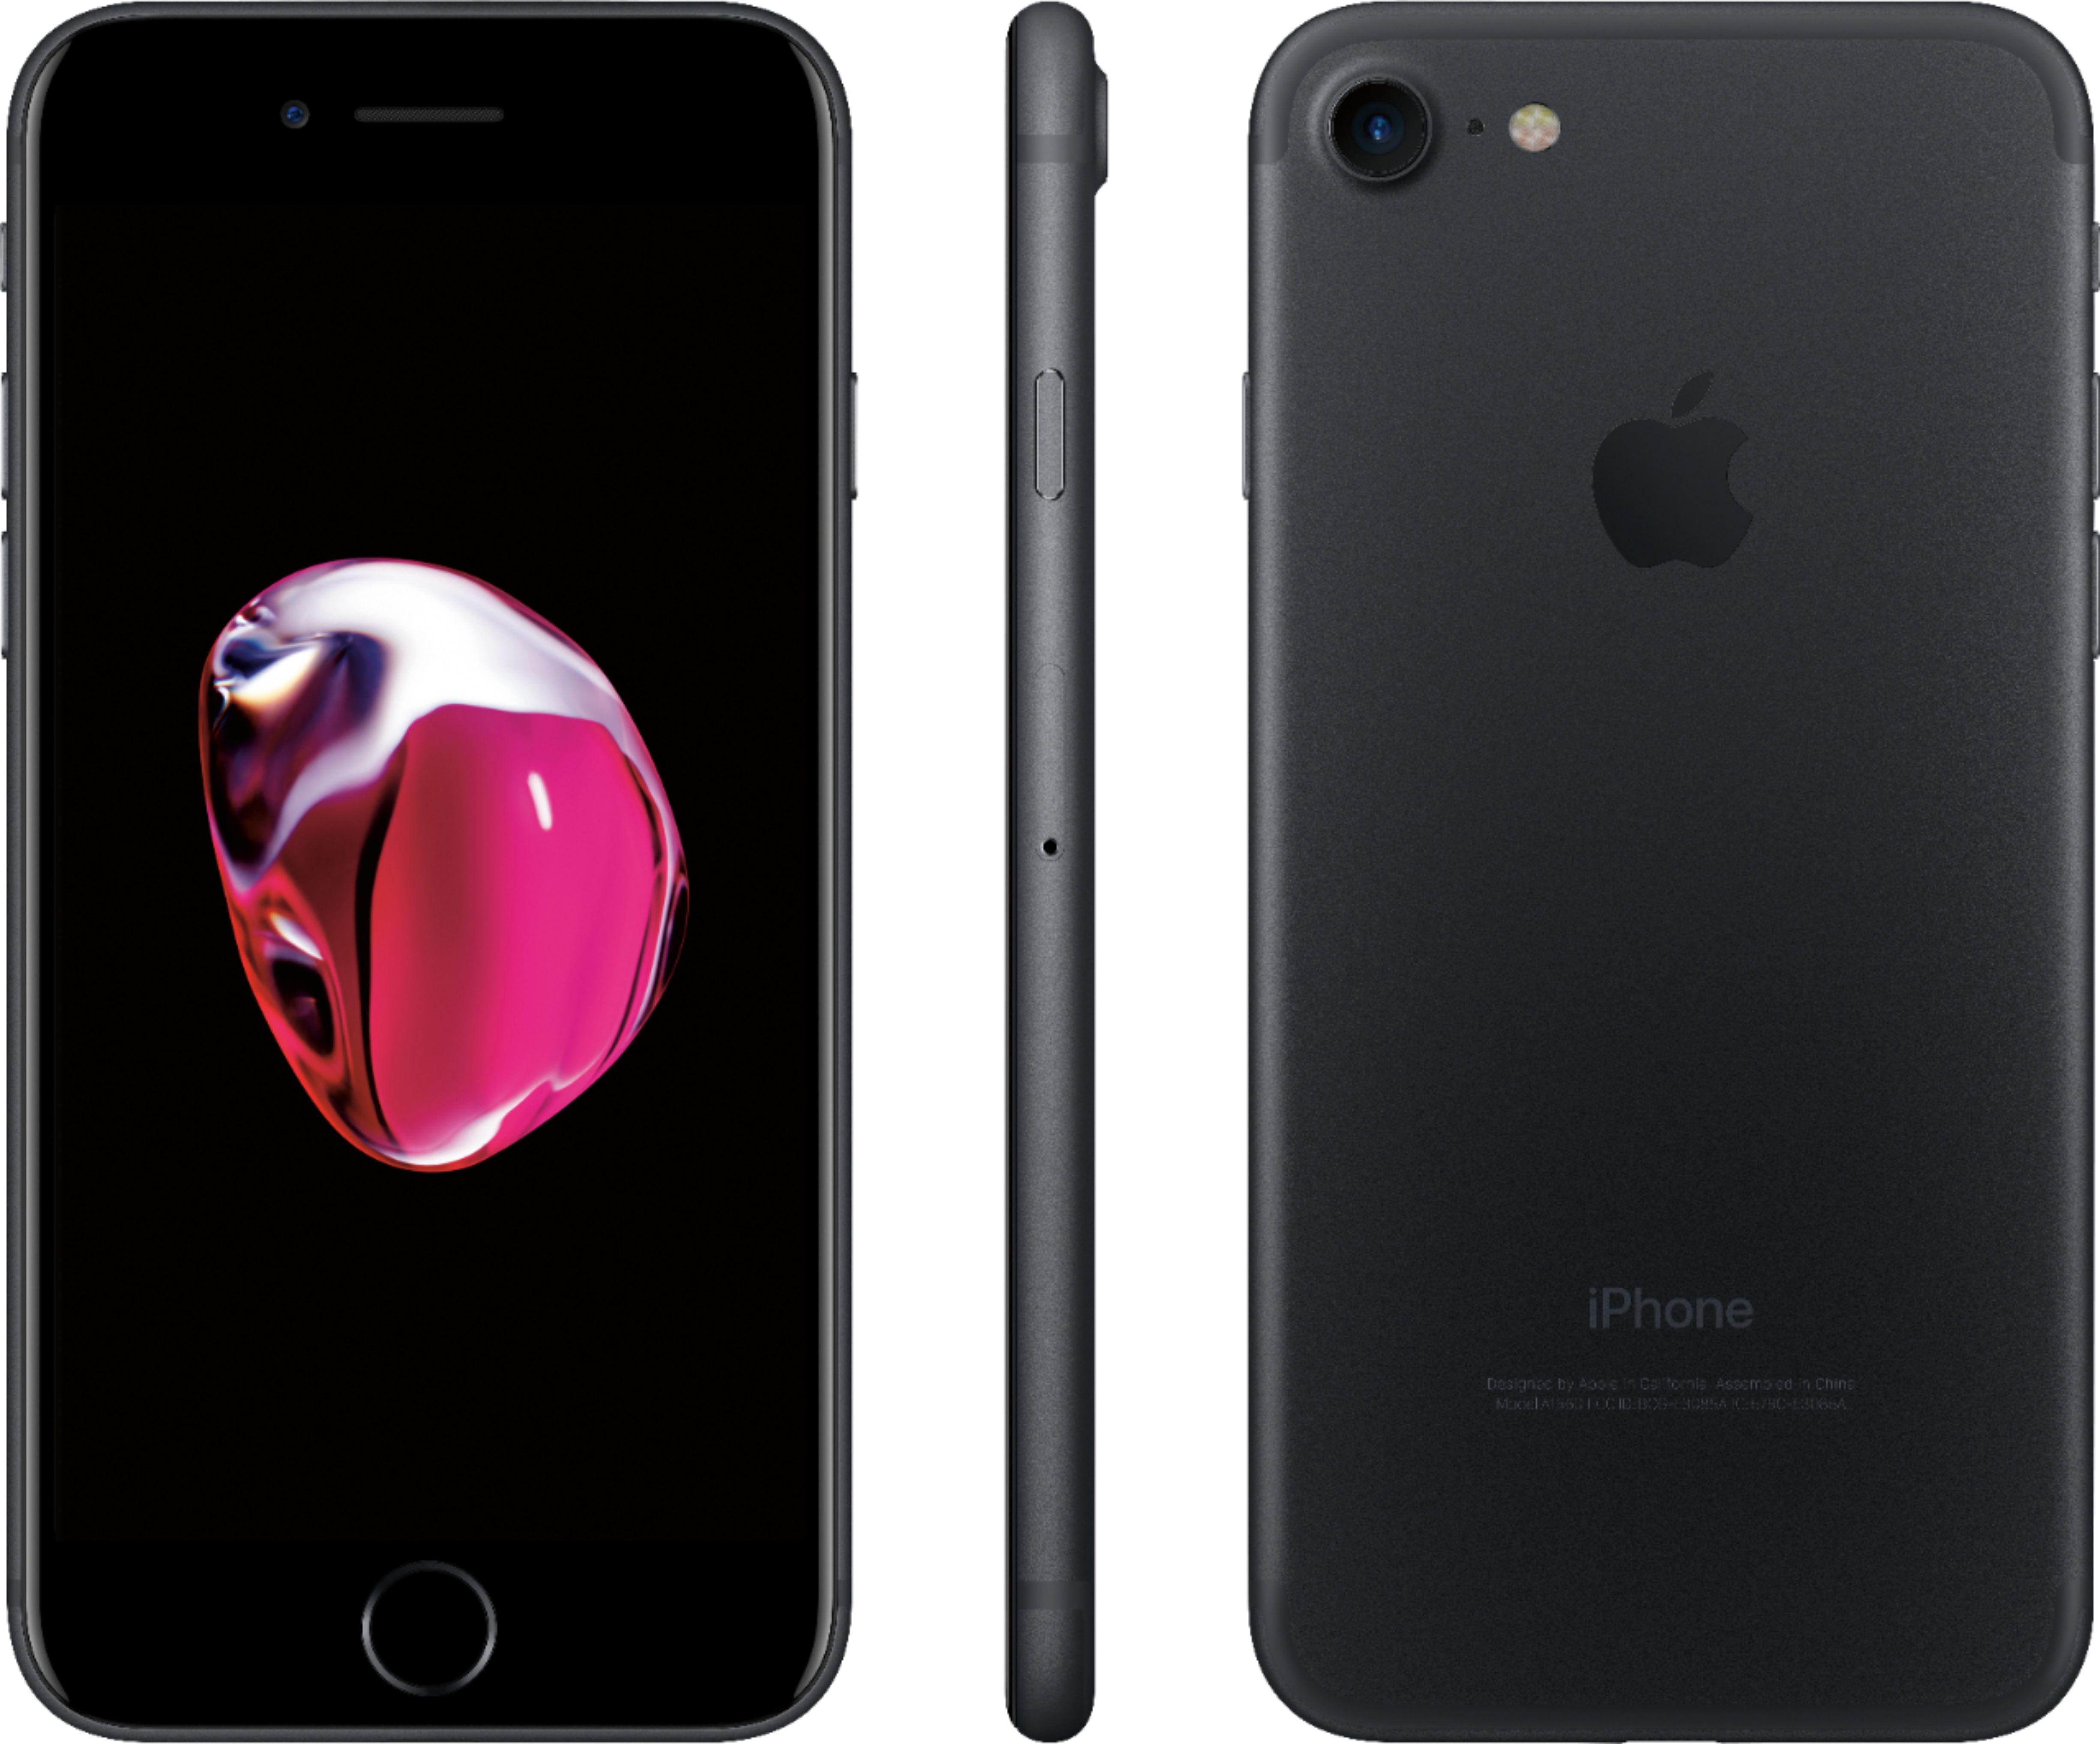 Original New Unlocked Apple iPhone 7/7 Plus 4G LTE Facetime 12MP Camera 4.7/5.5